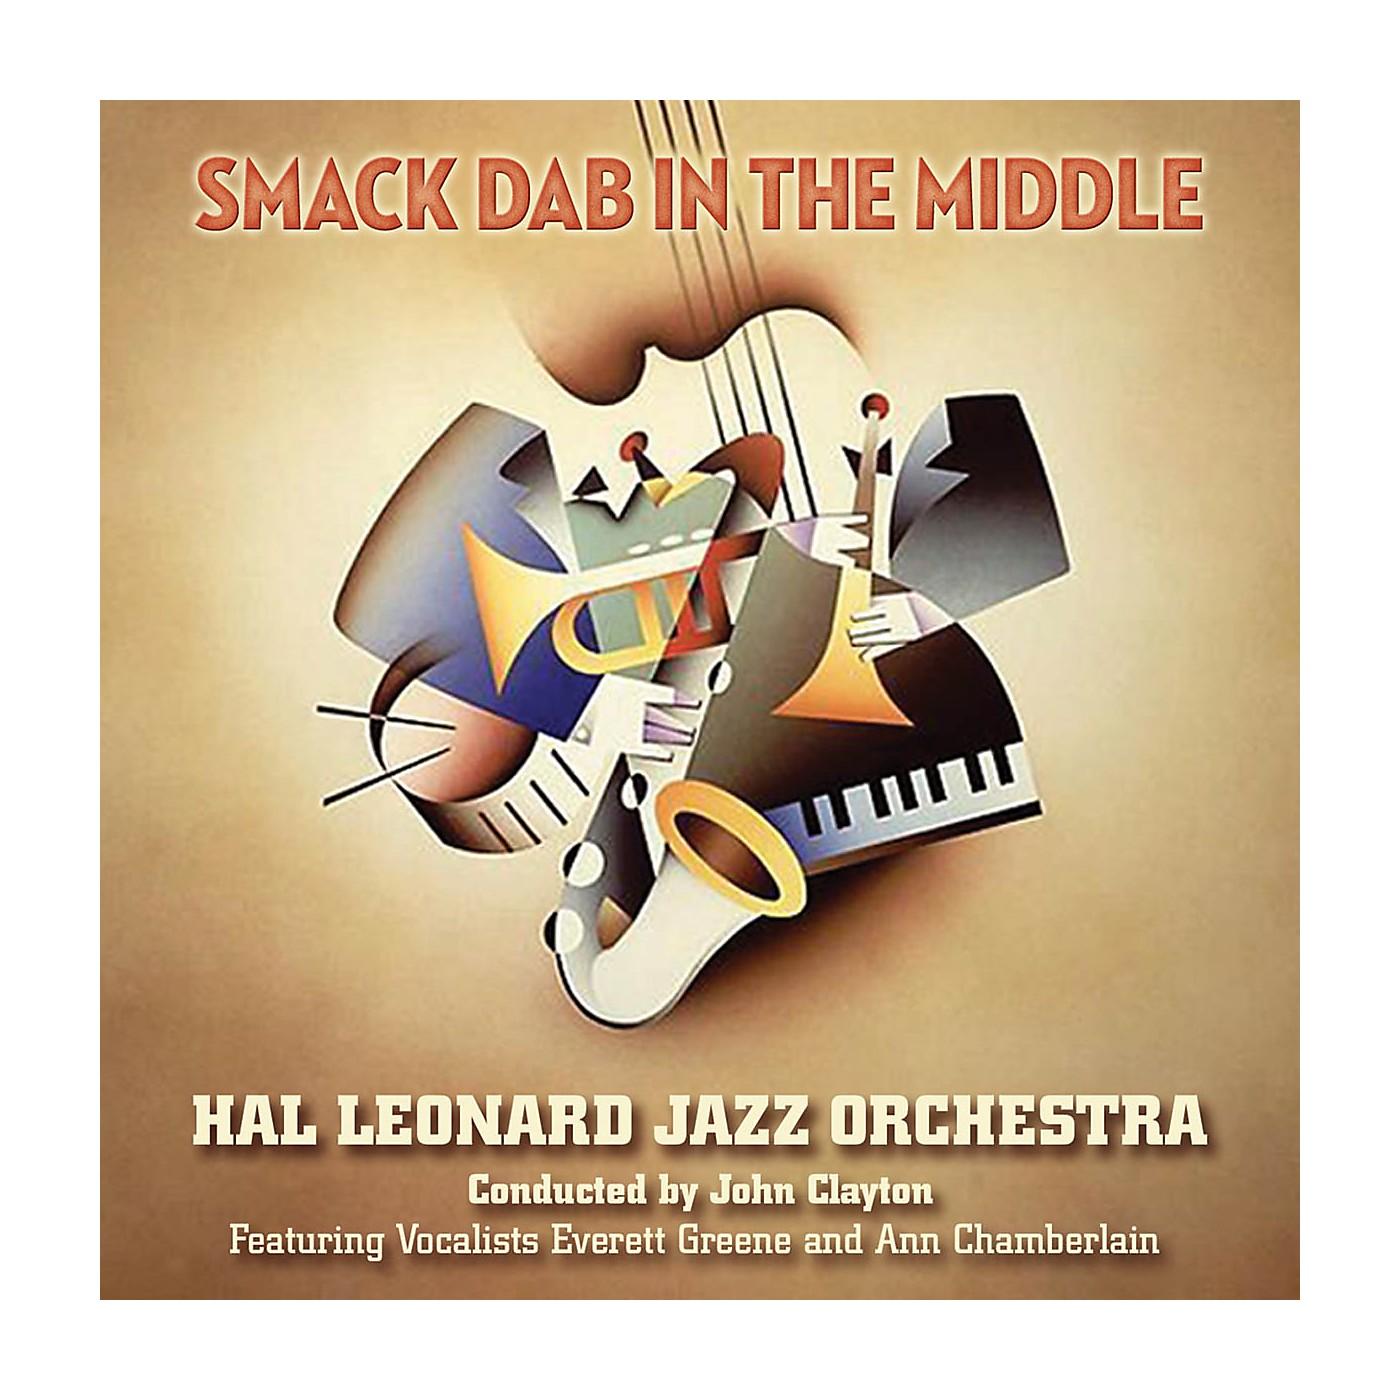 Hal Leonard Smack Dab in the Middle Jazz Band Level 5 Arranged by Sammy Nestico thumbnail